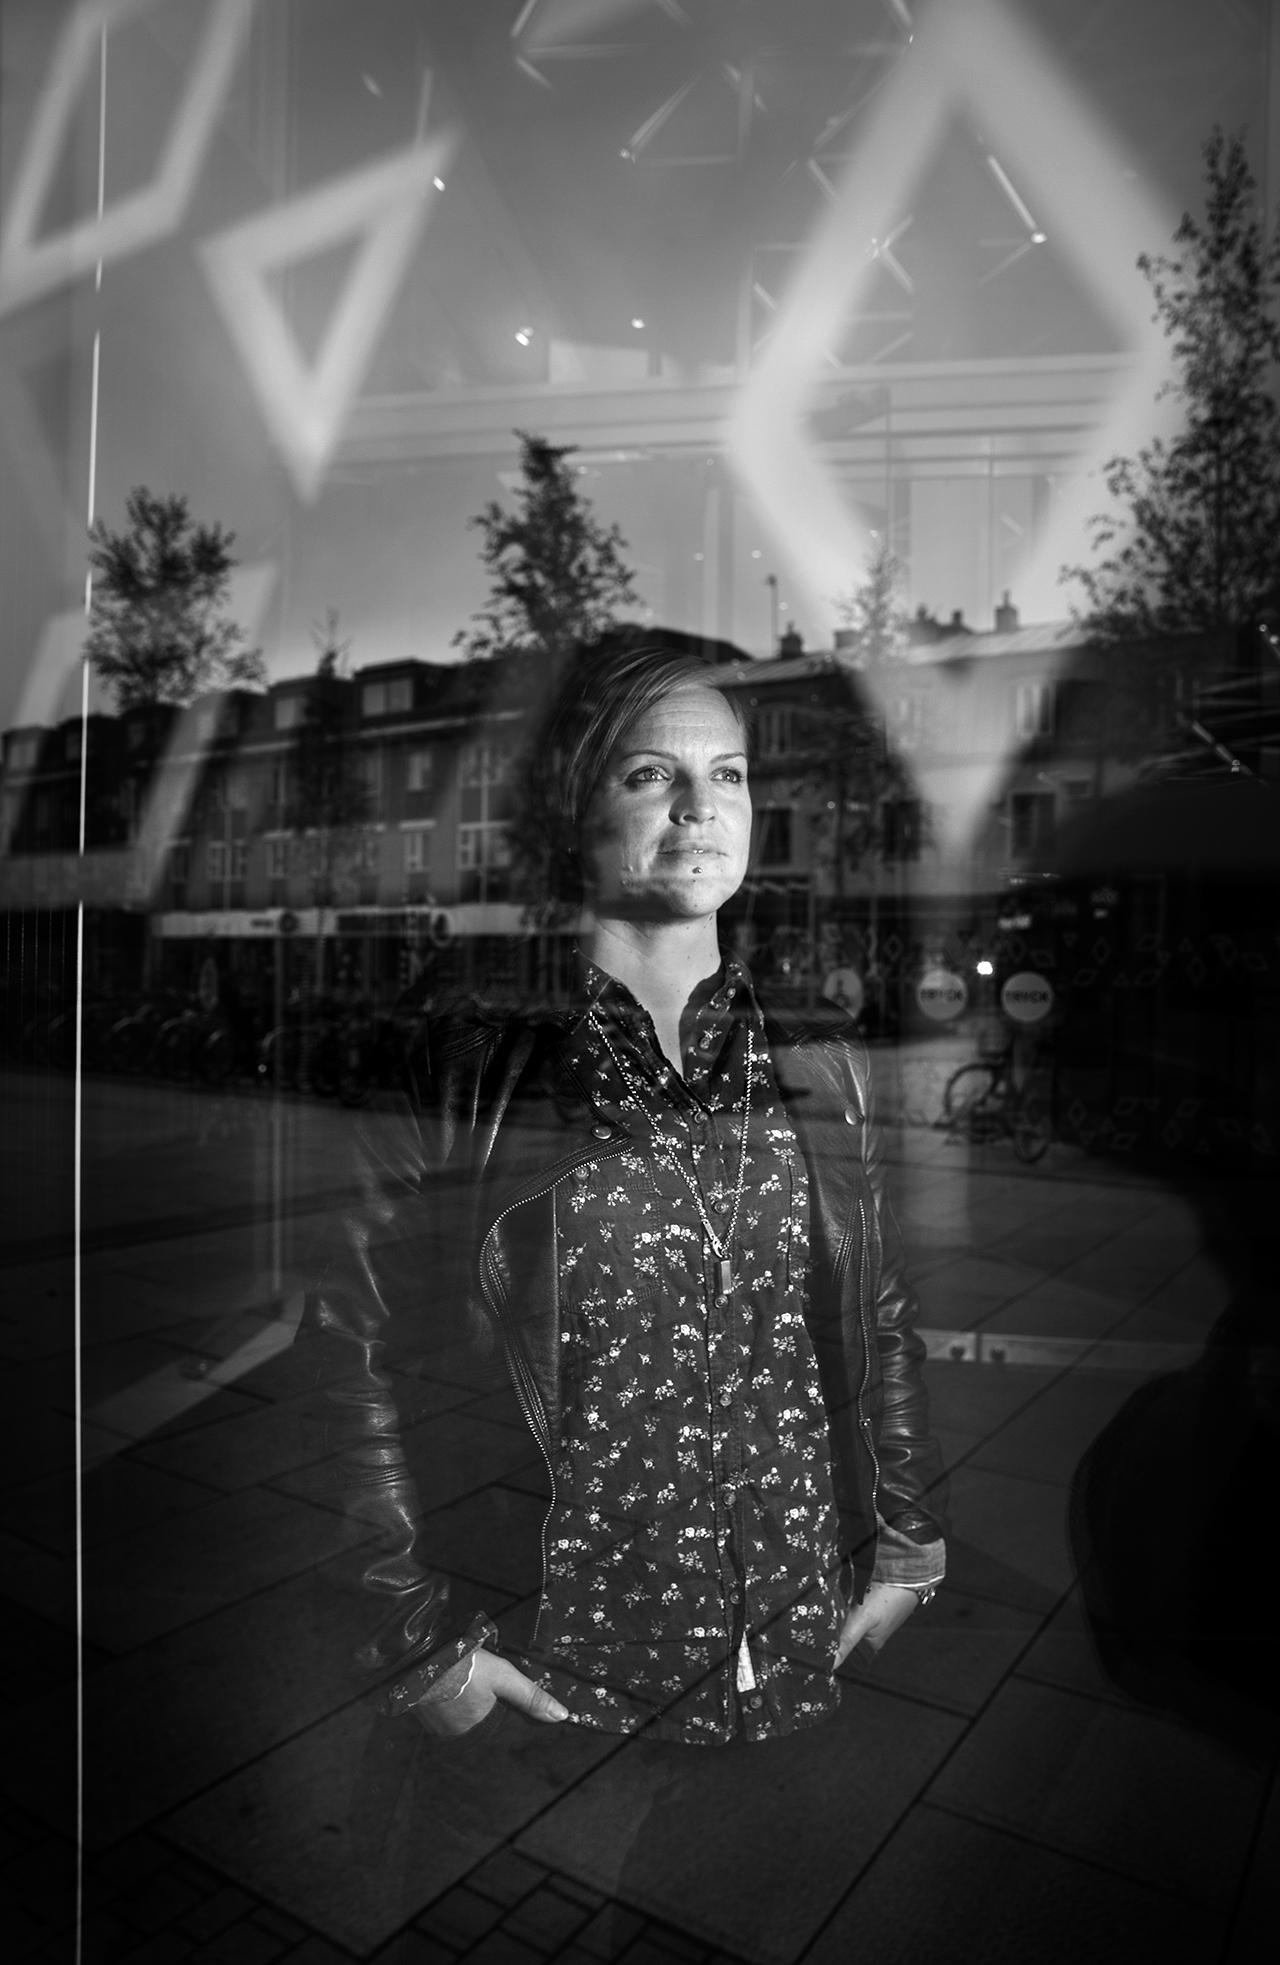 Mona Linden, Umeå.